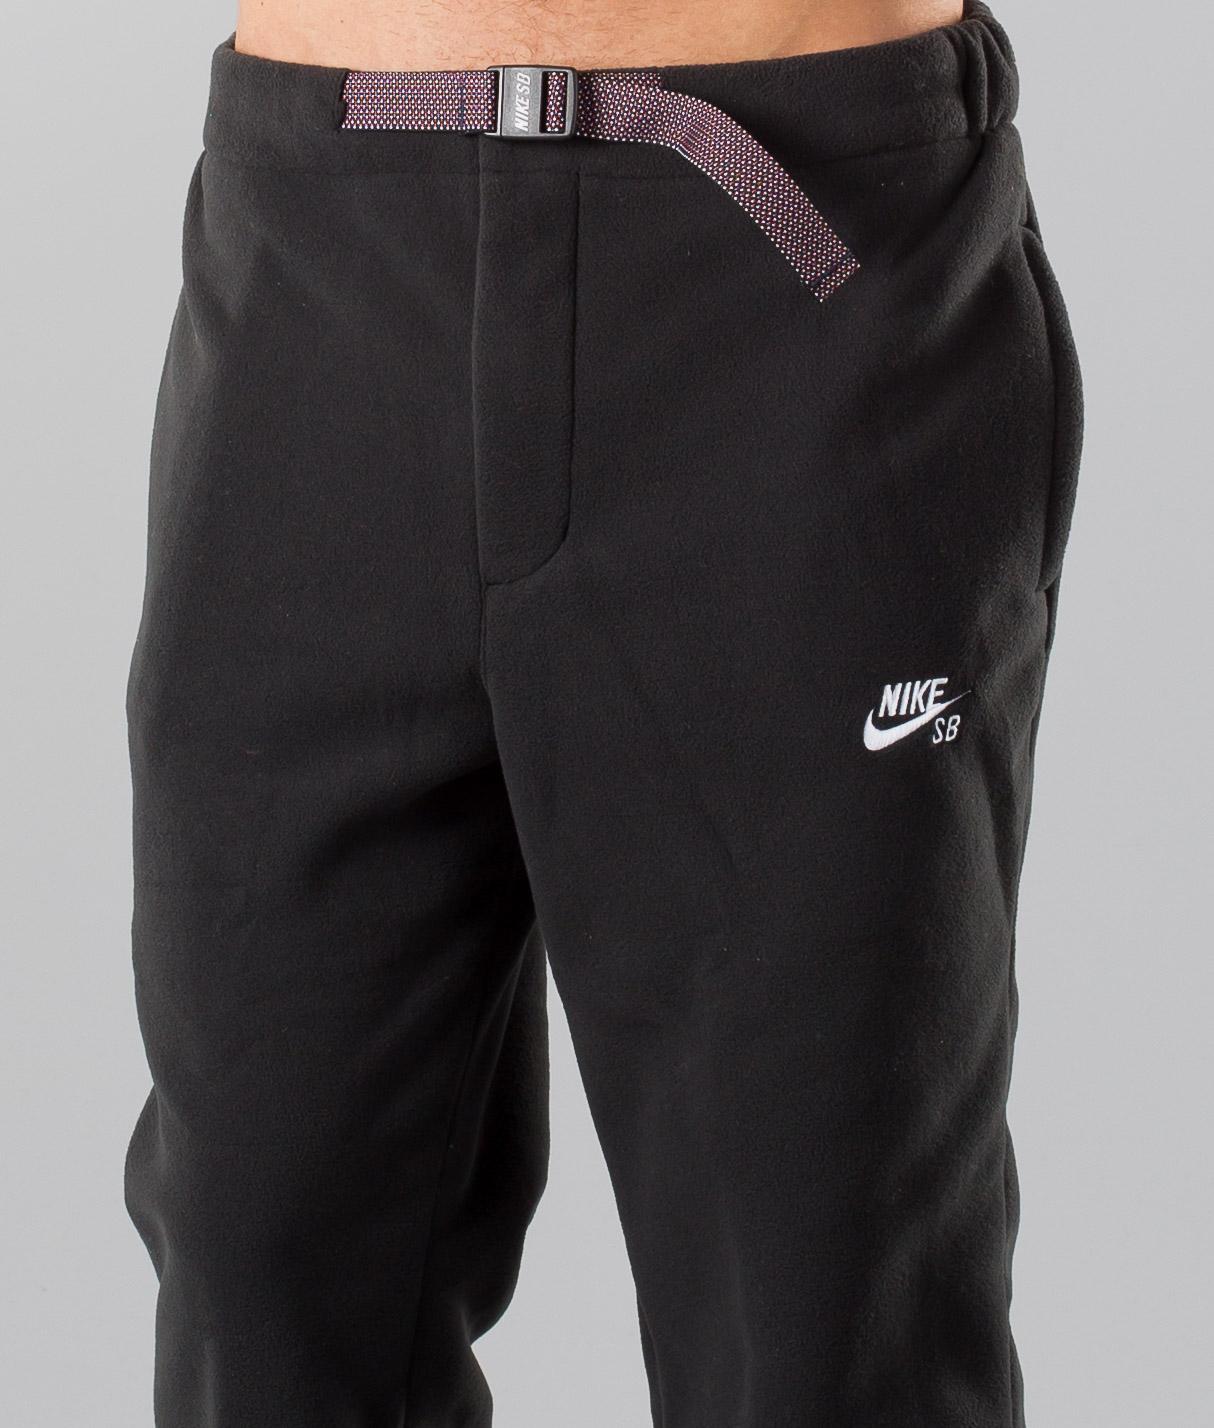 Nike SB Novelty Fleece Housut BlackSail Ridestore.fi